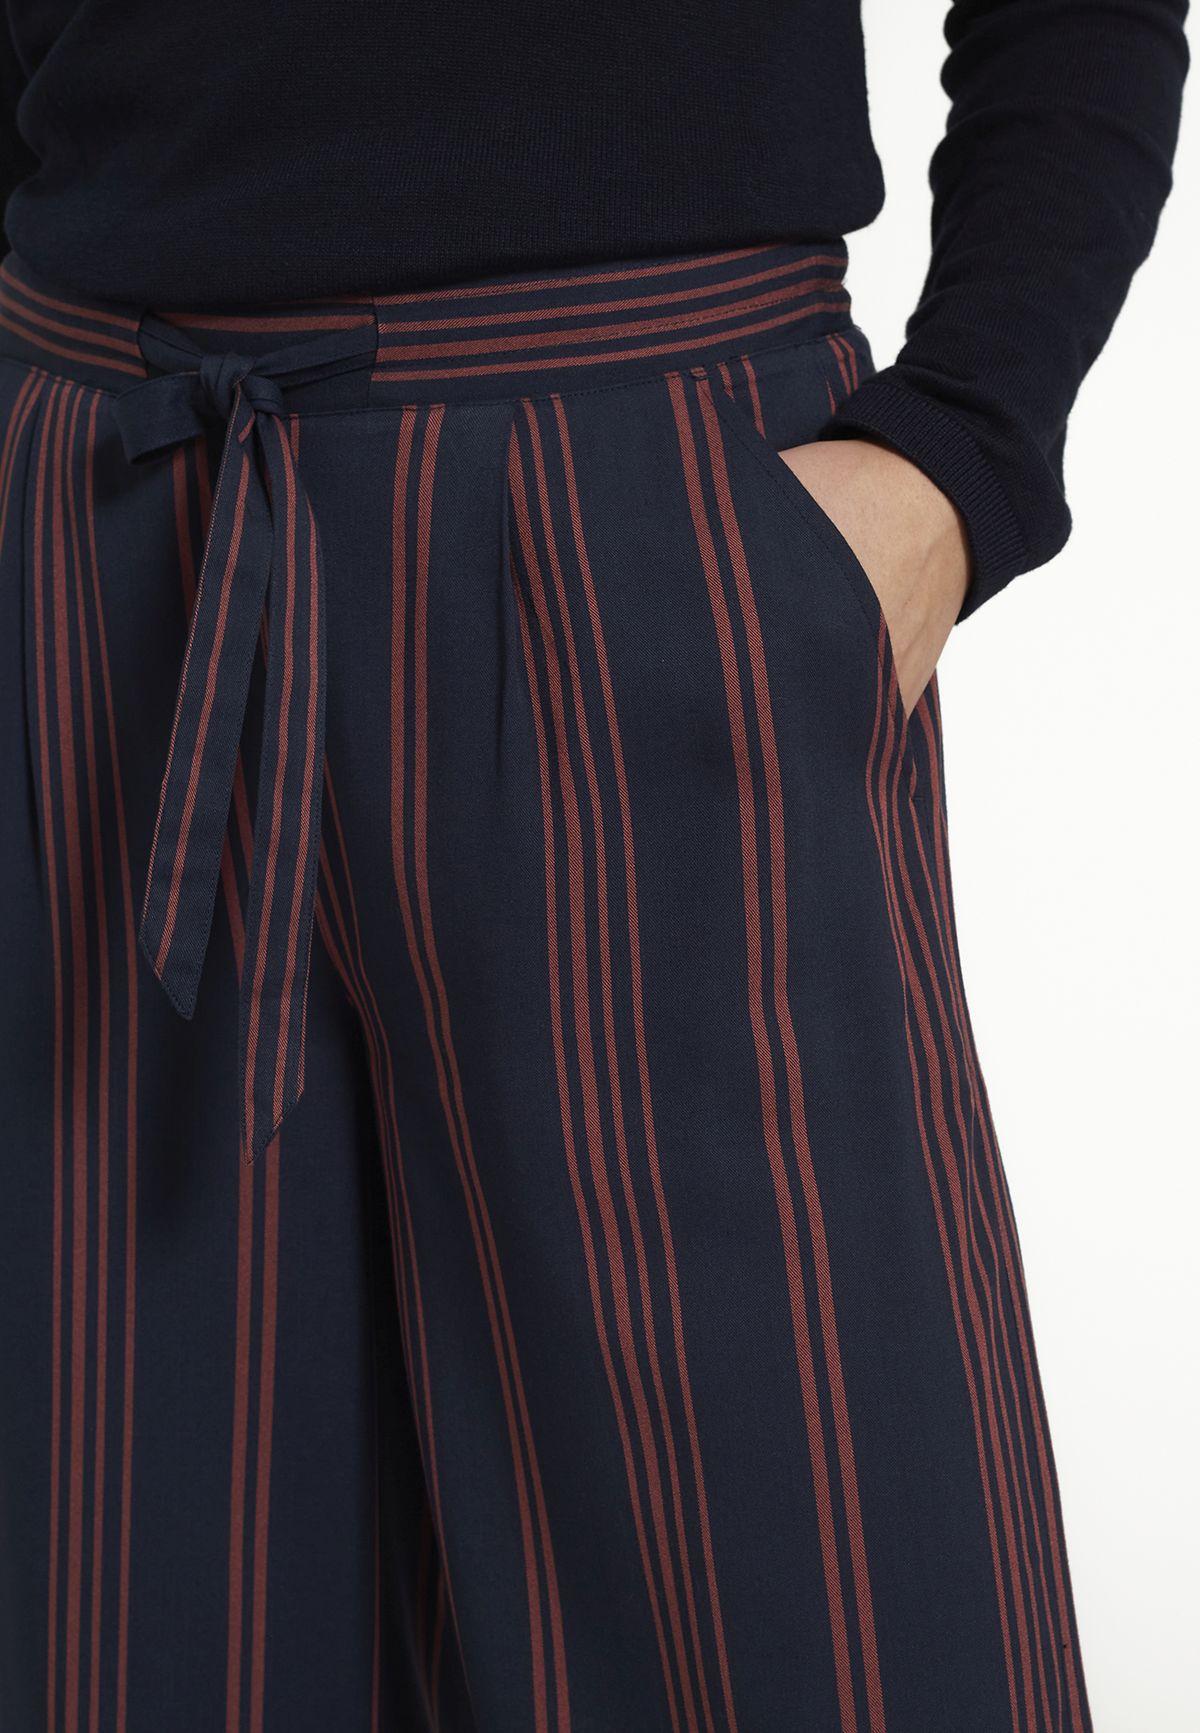 Gestreifte Damen-Culotte PERSEA ruby red/ navy